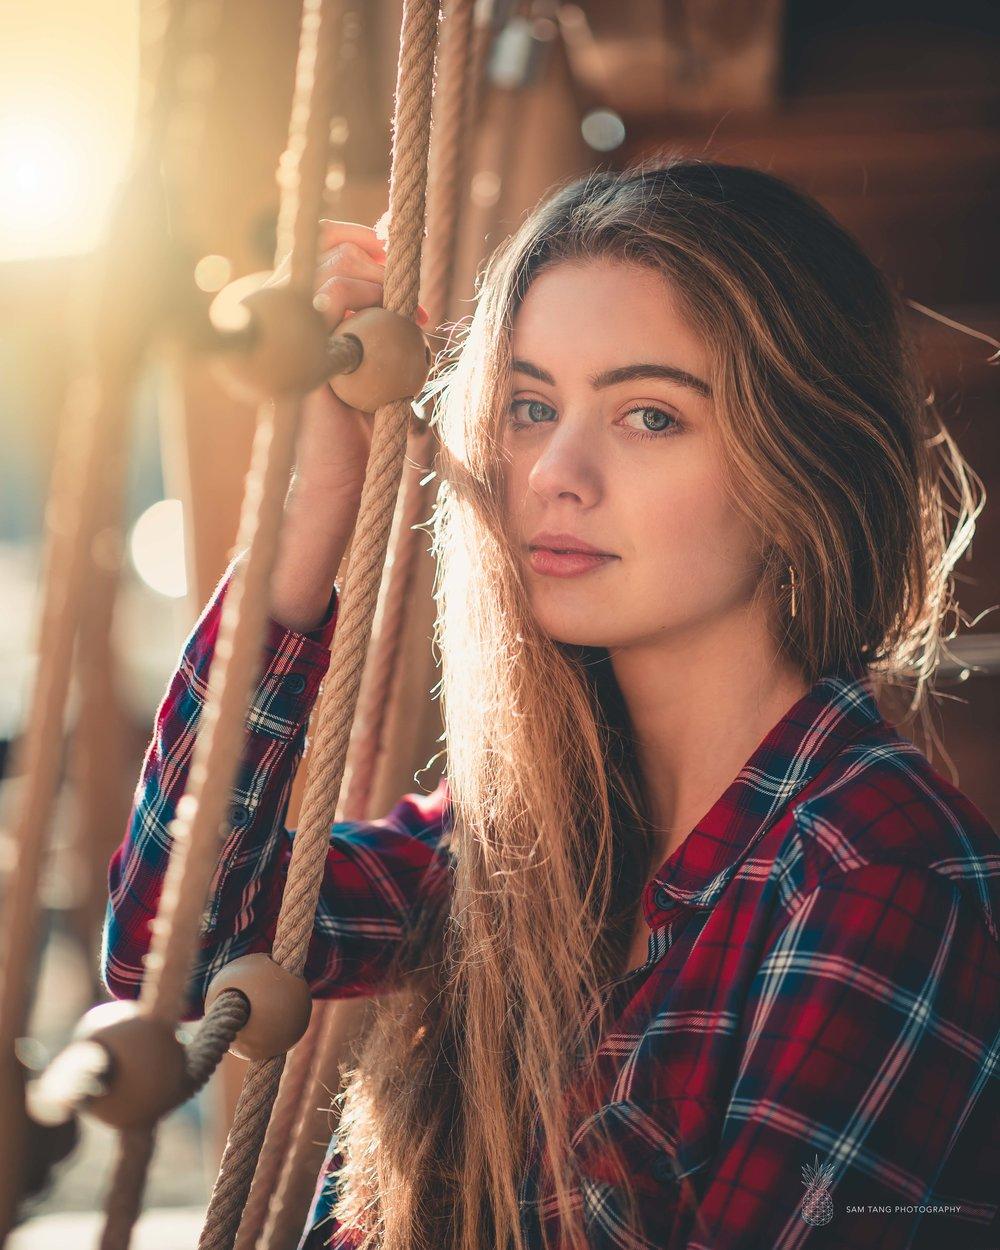 fotoshoot prijzen model portret fotografie mechelen